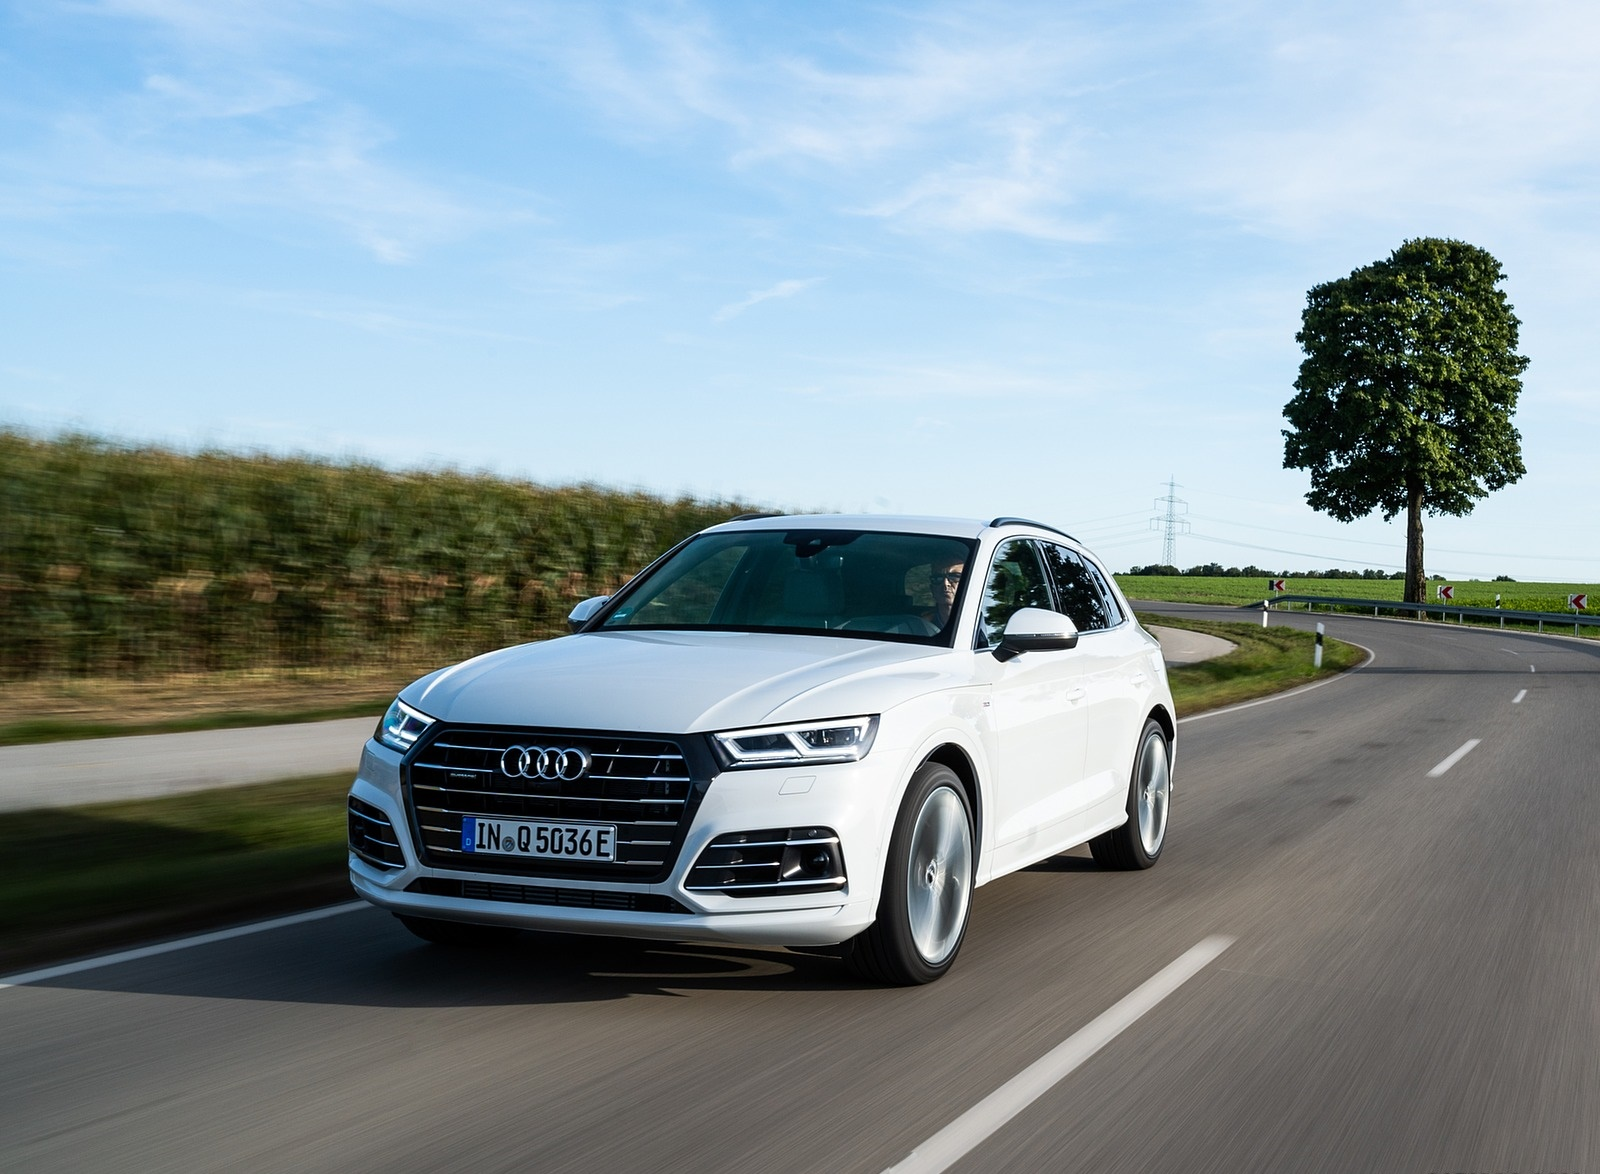 2020 Audi Q5 TFSI e Plug-In Hybrid (Color: Glacier White) Front Three-Quarter Wallpapers #8 of 154